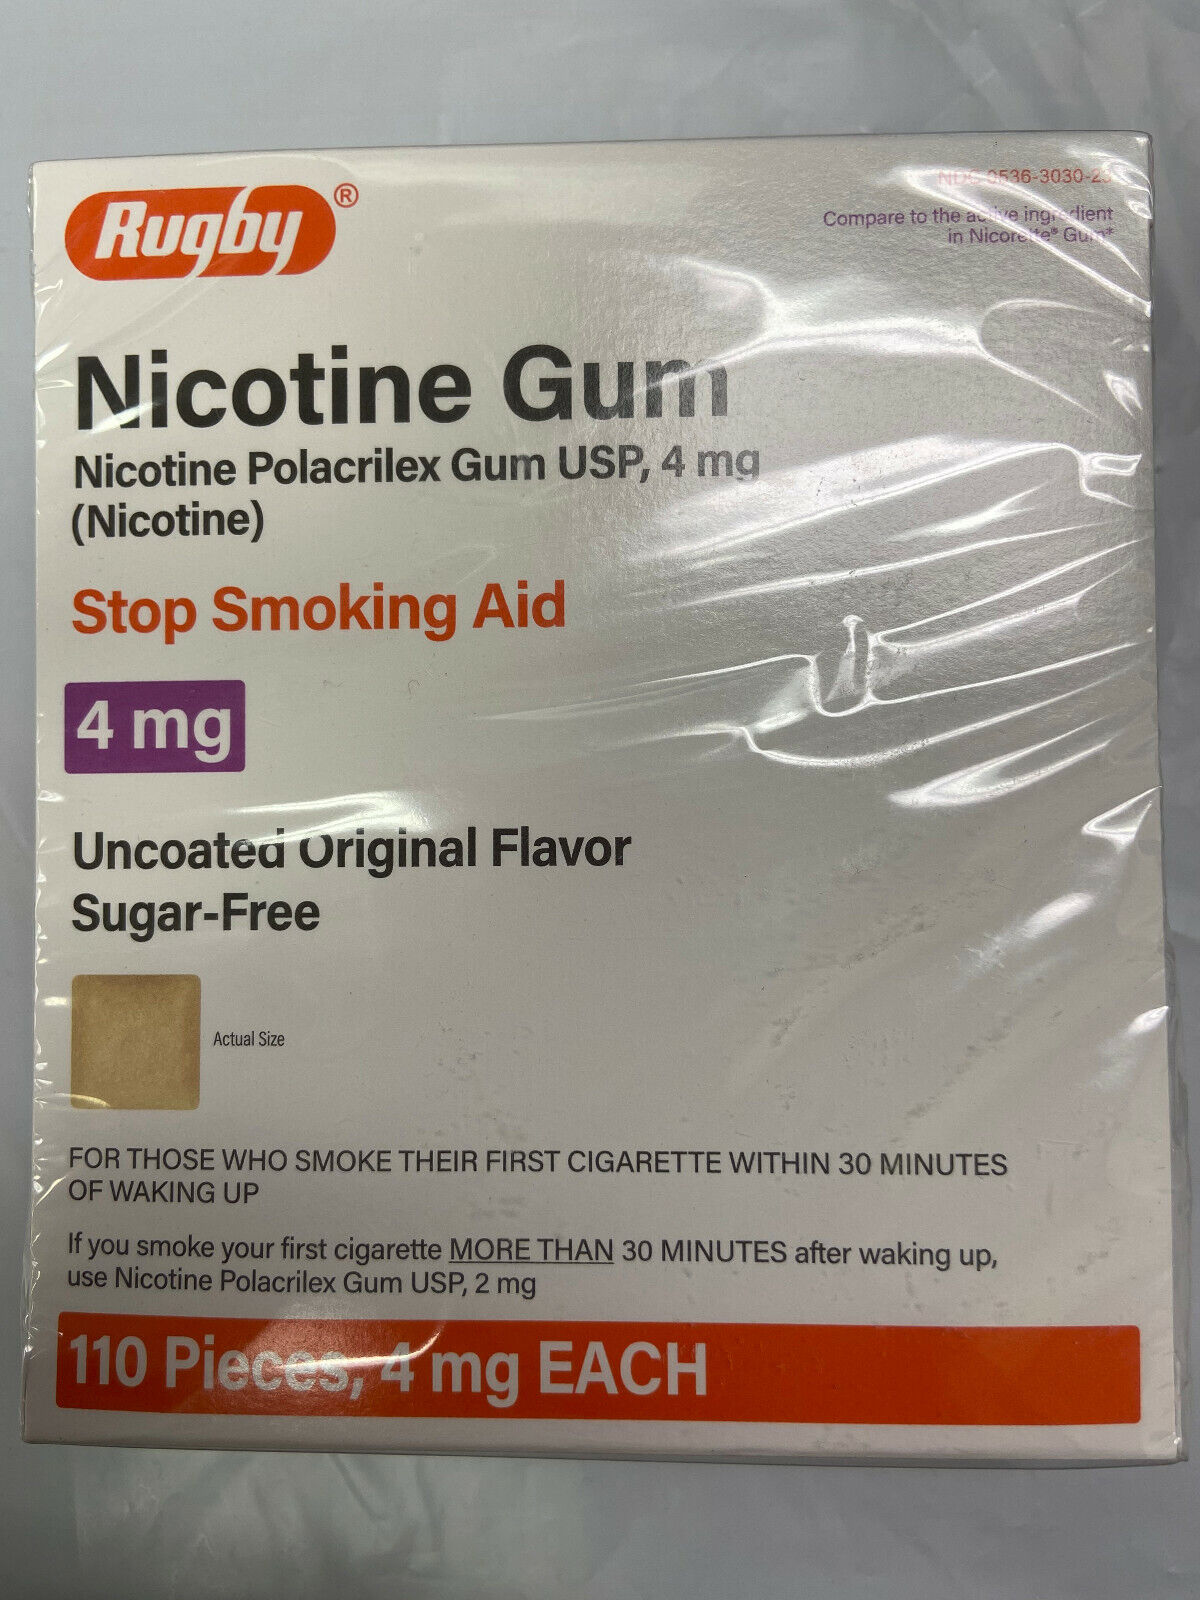 100 Rugby Sugar Free Nicotine Polacrilex Gum 4 MG Uncoated Original Flavor - $19.95